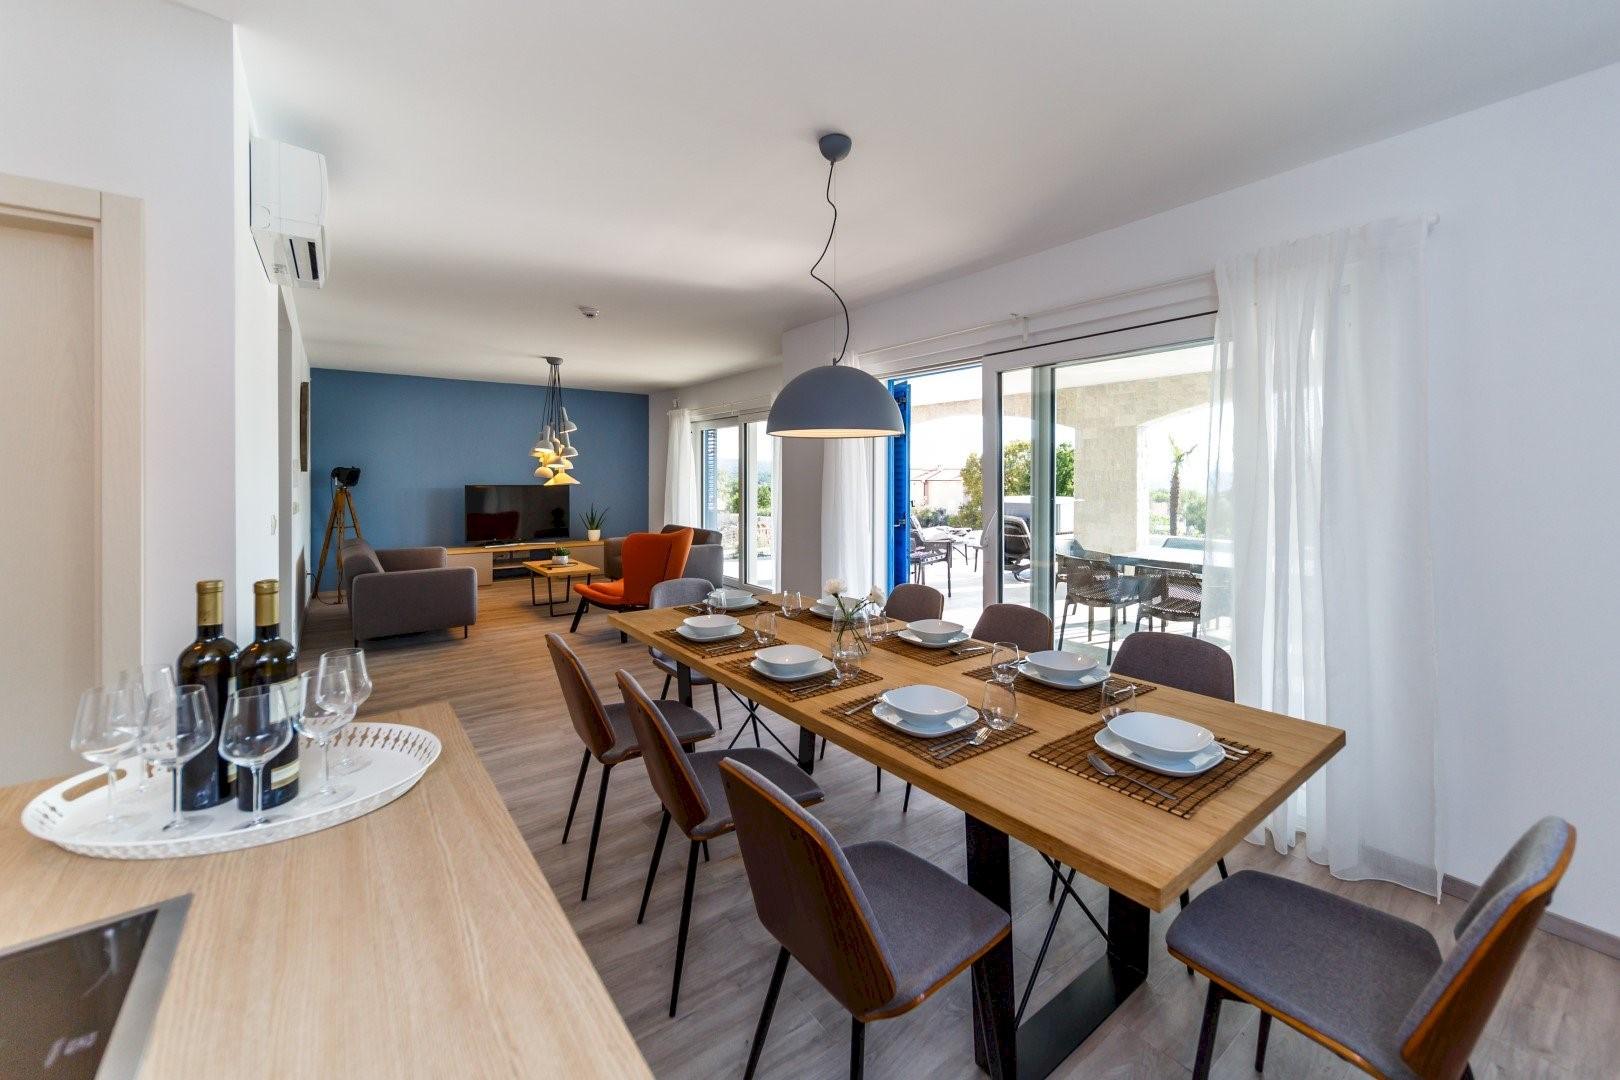 Ferienhaus Luxury Villa Loma 1 (2586644), Sveti Vid-Miholjice, Insel Krk, Kvarner, Kroatien, Bild 8